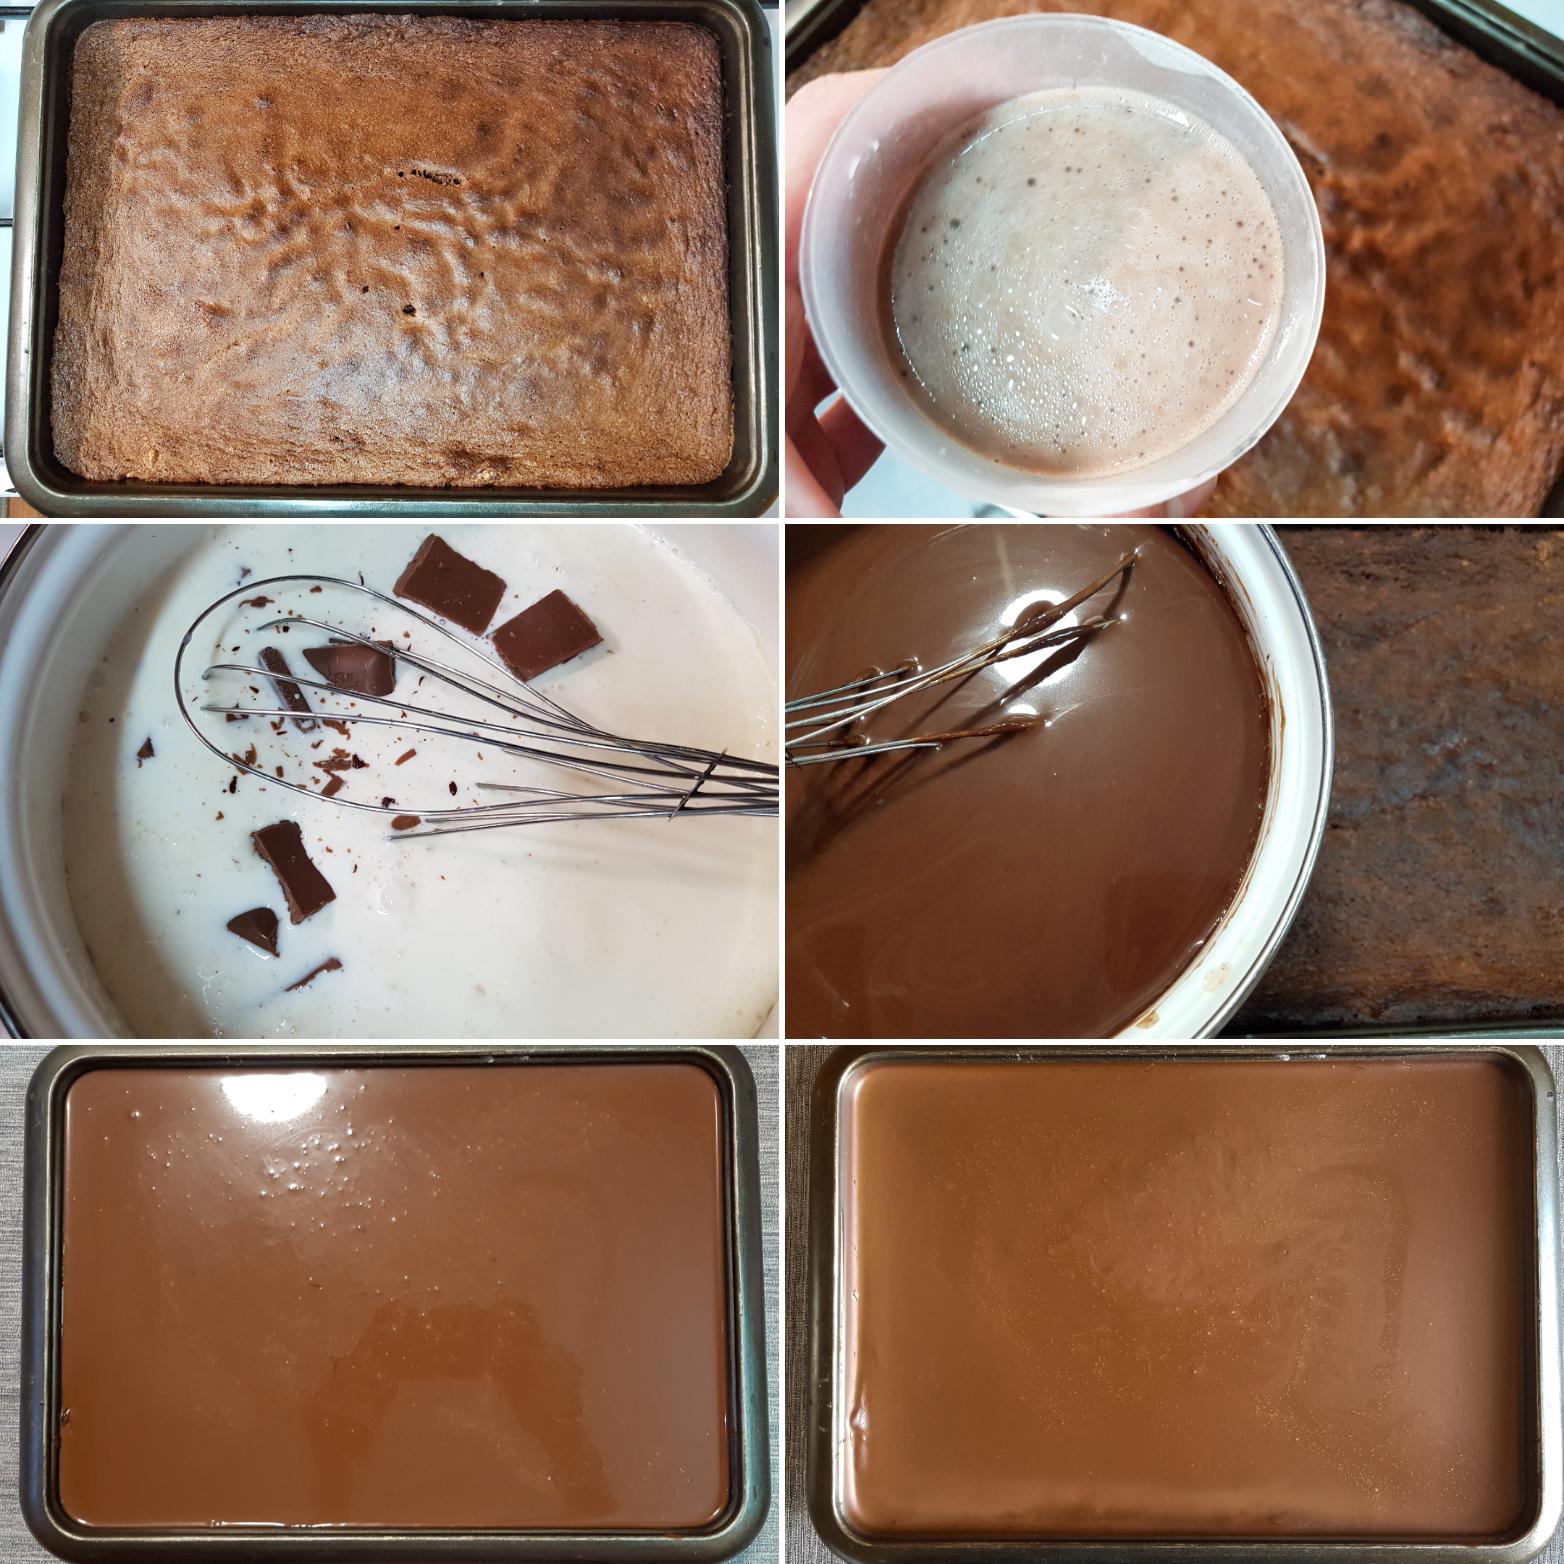 Becke-cokoladne-kocke-9